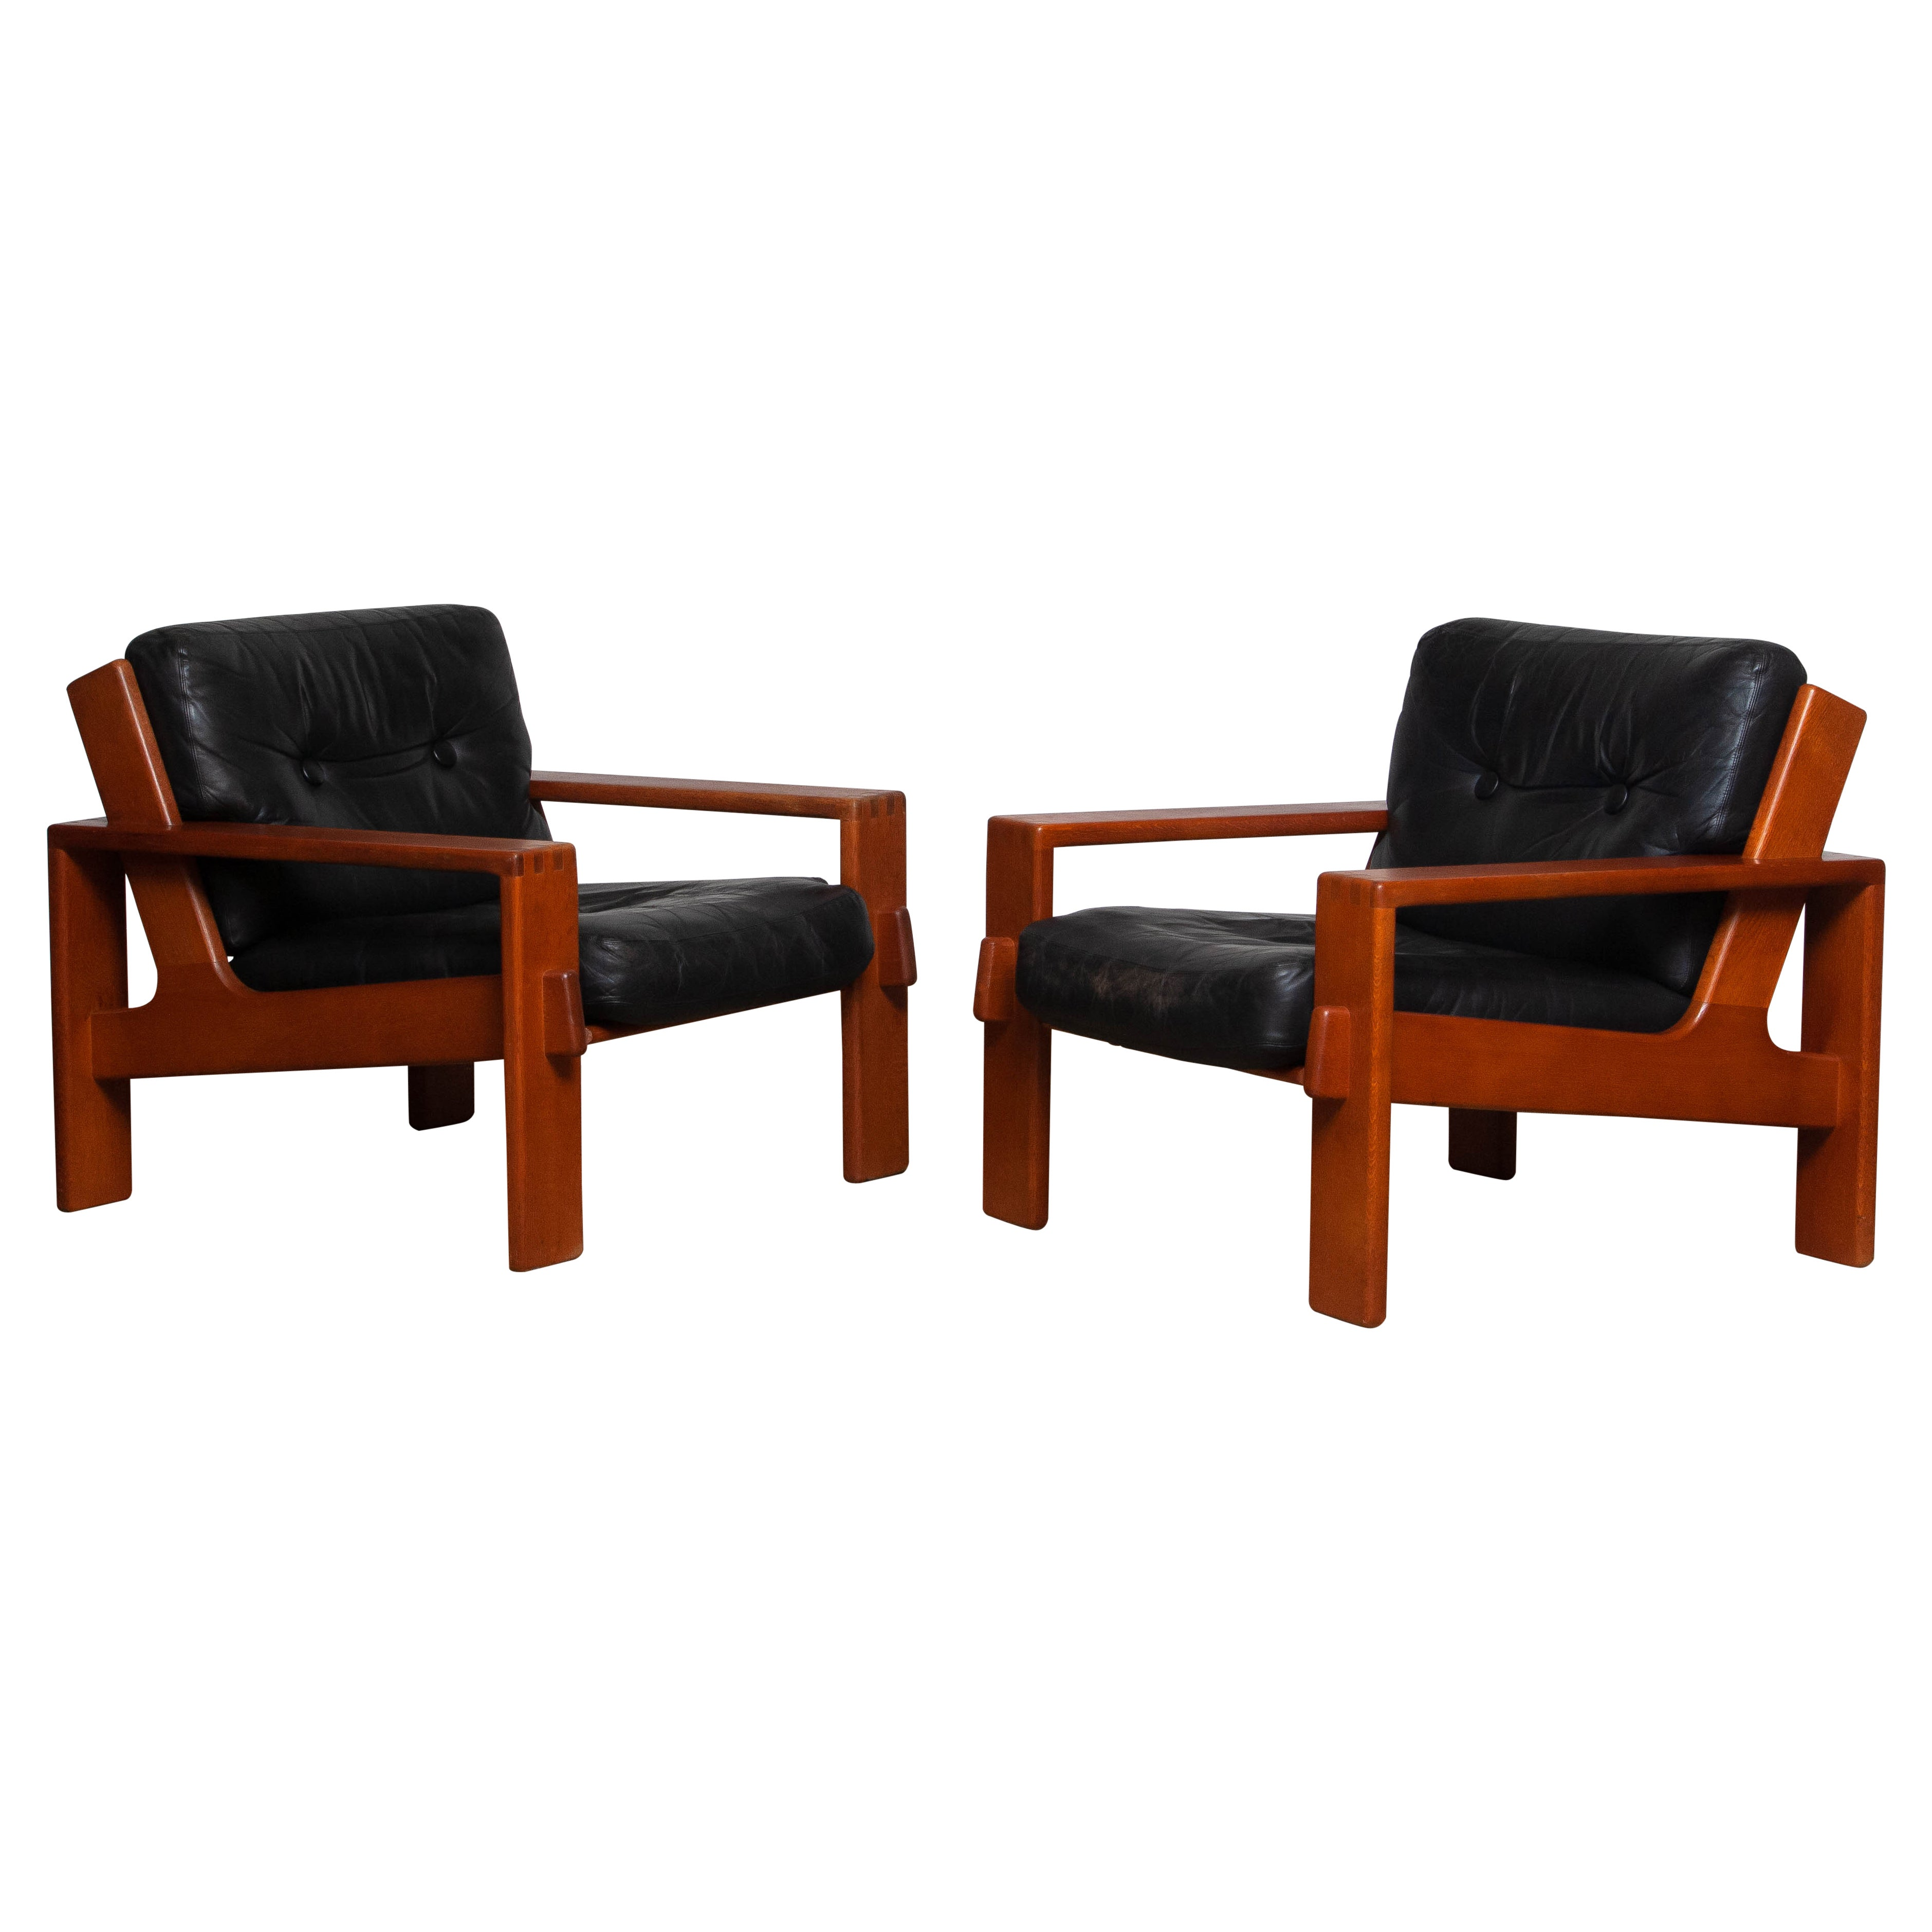 1960 Pair Teak And Black Leather Cubist Lounge Chair by Esko Pajamies for Asko.